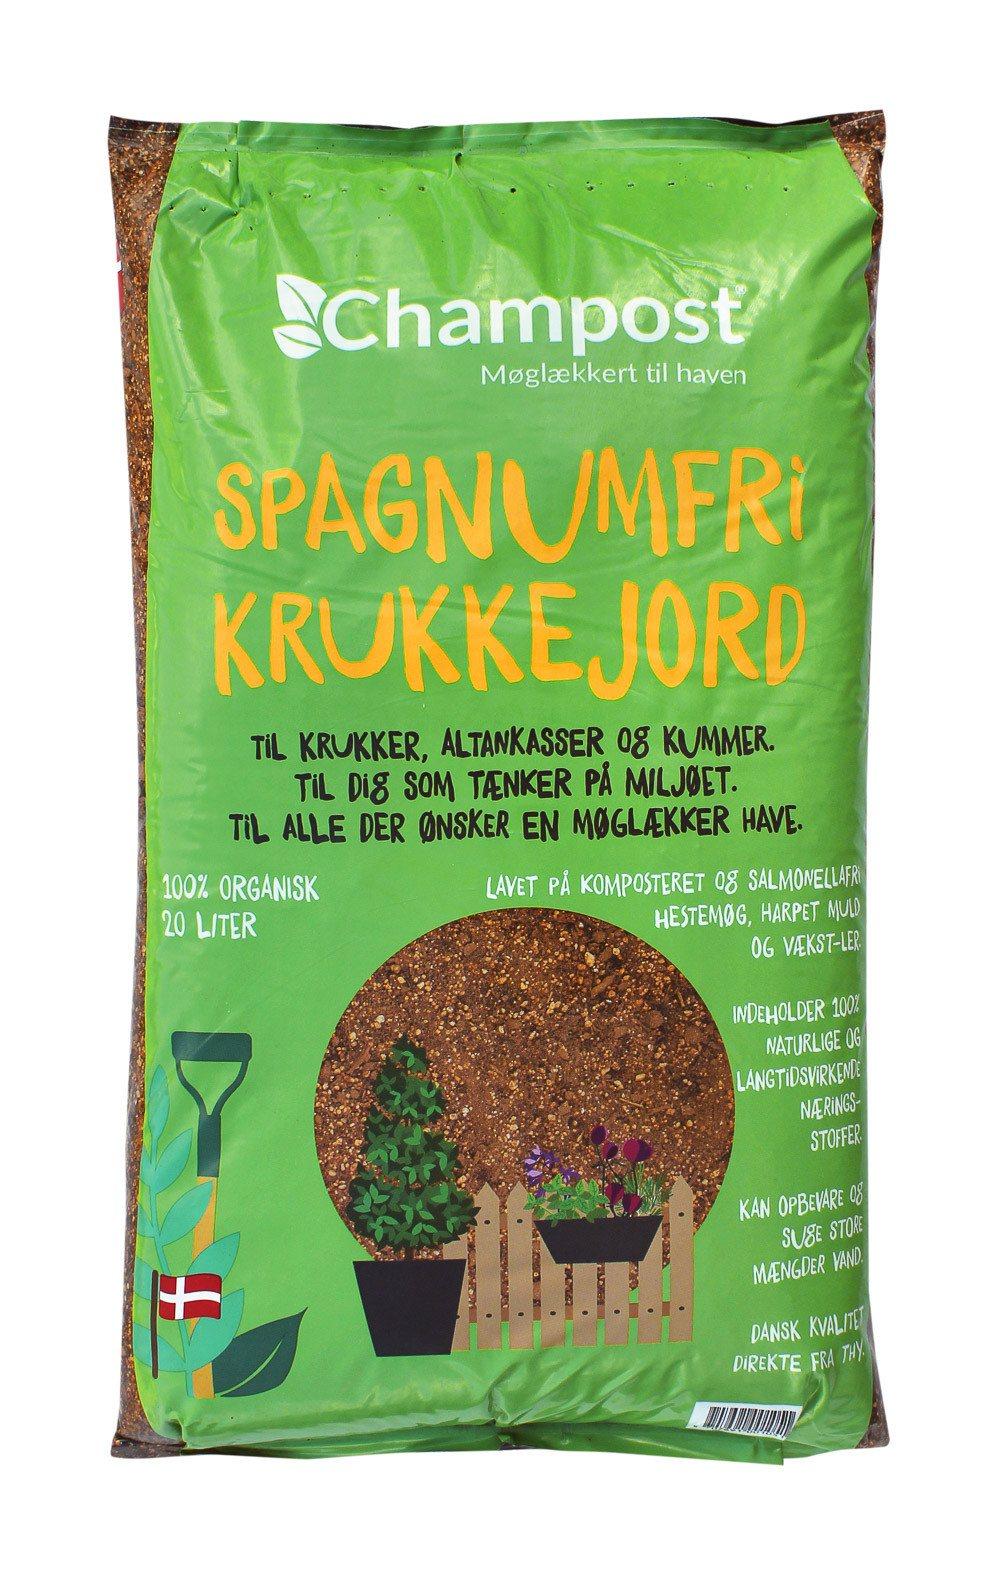 Champost Krukkejord Spagnumfri - 20 liters pose